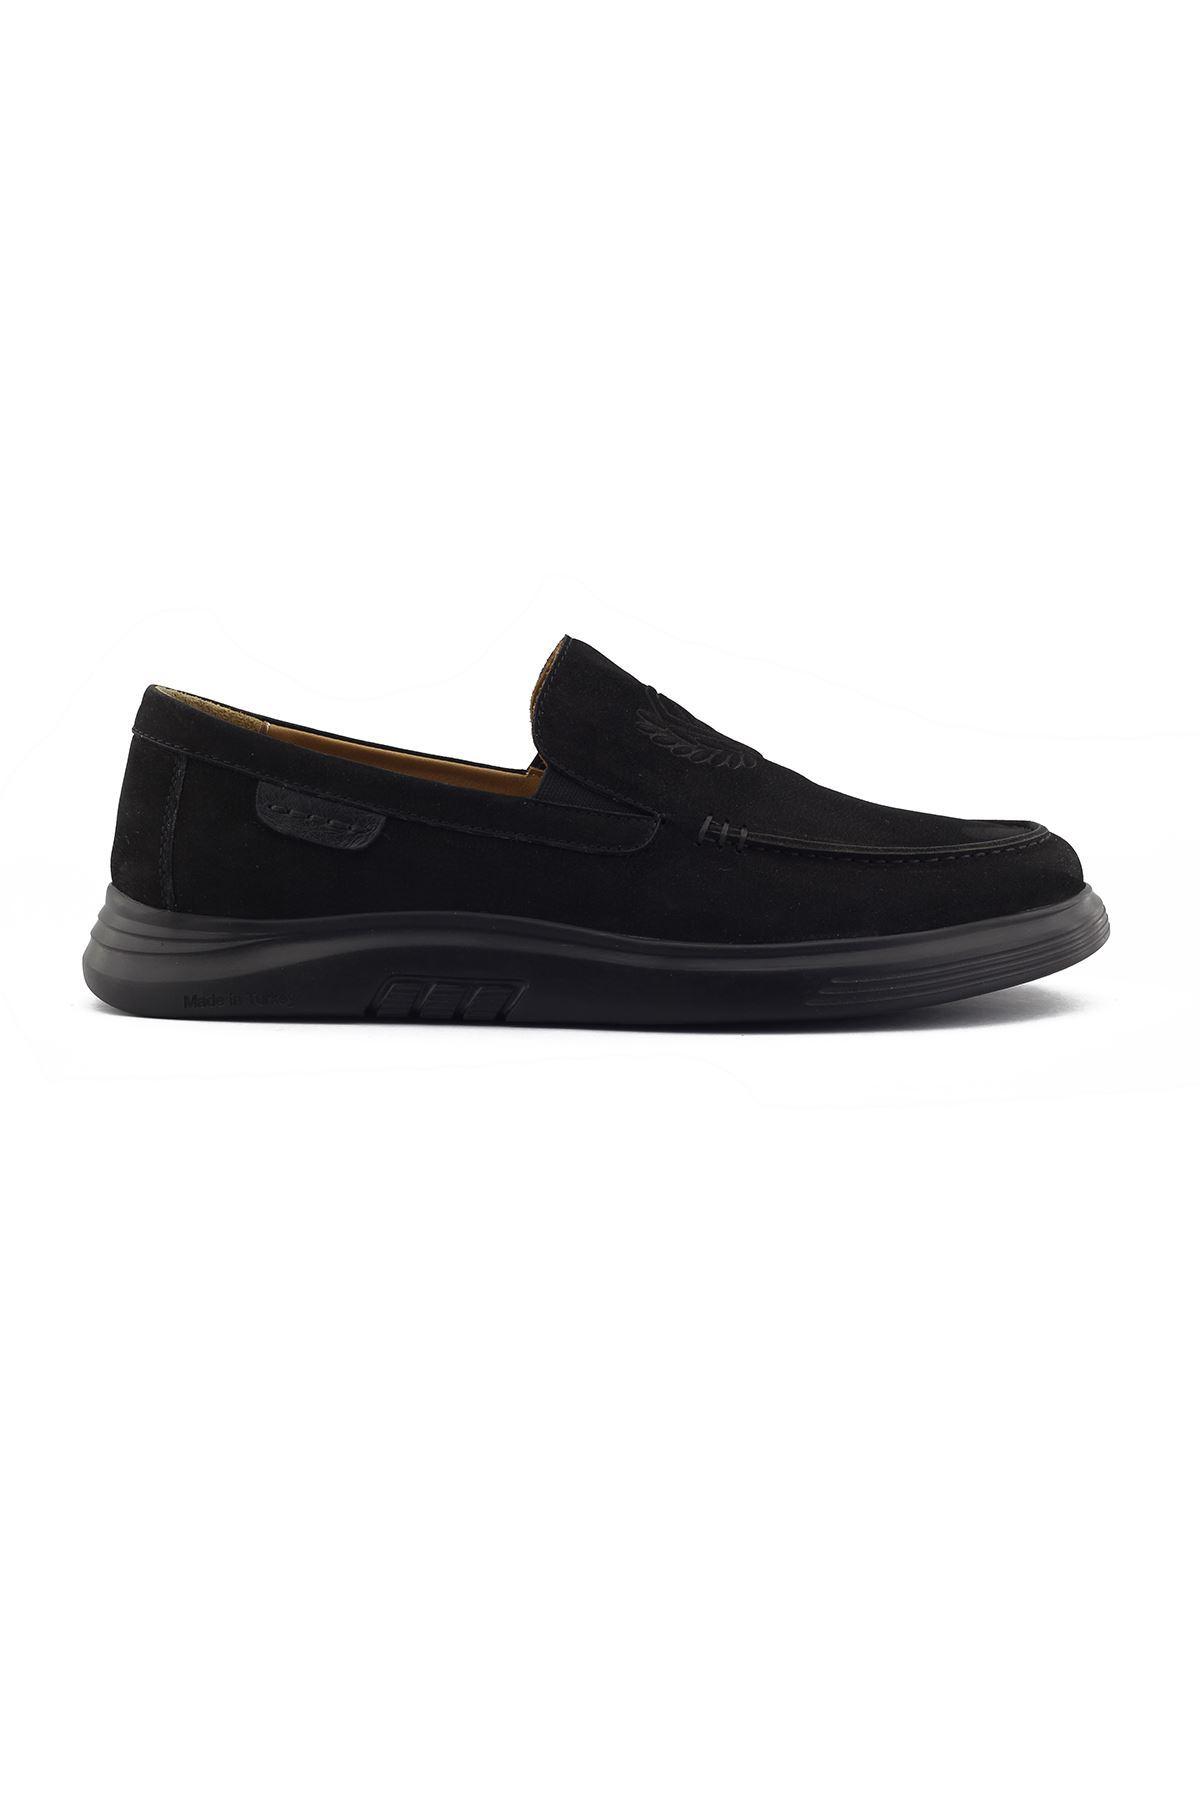 2105 Nubuk Siyah Stil Erkek Ayakkabı